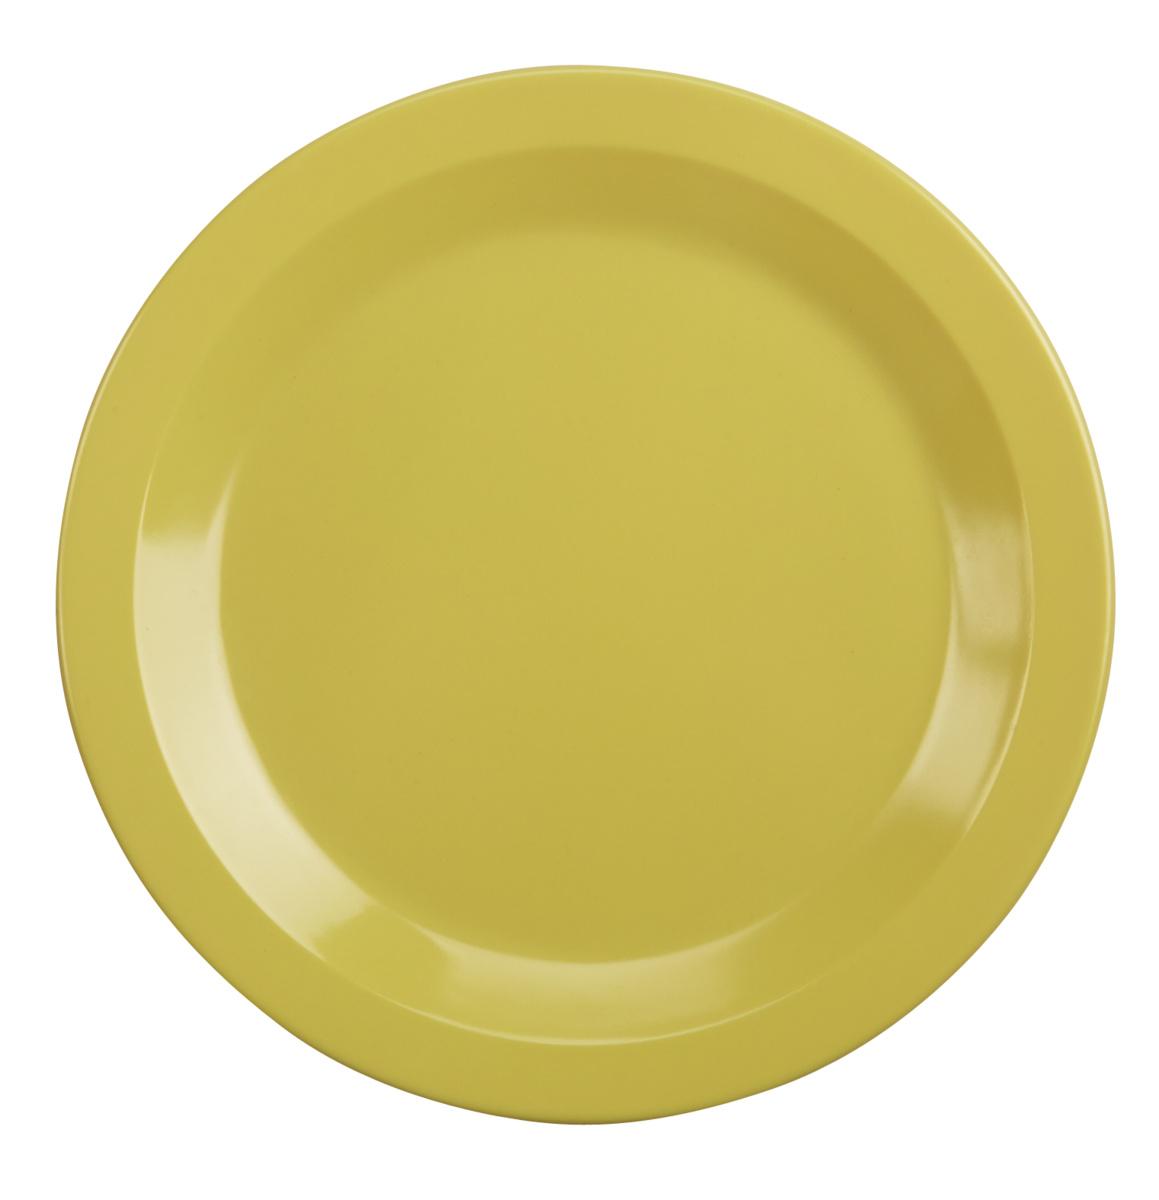 Assiette plate ronde jaune mélamine Ø 22,50 cm Platex